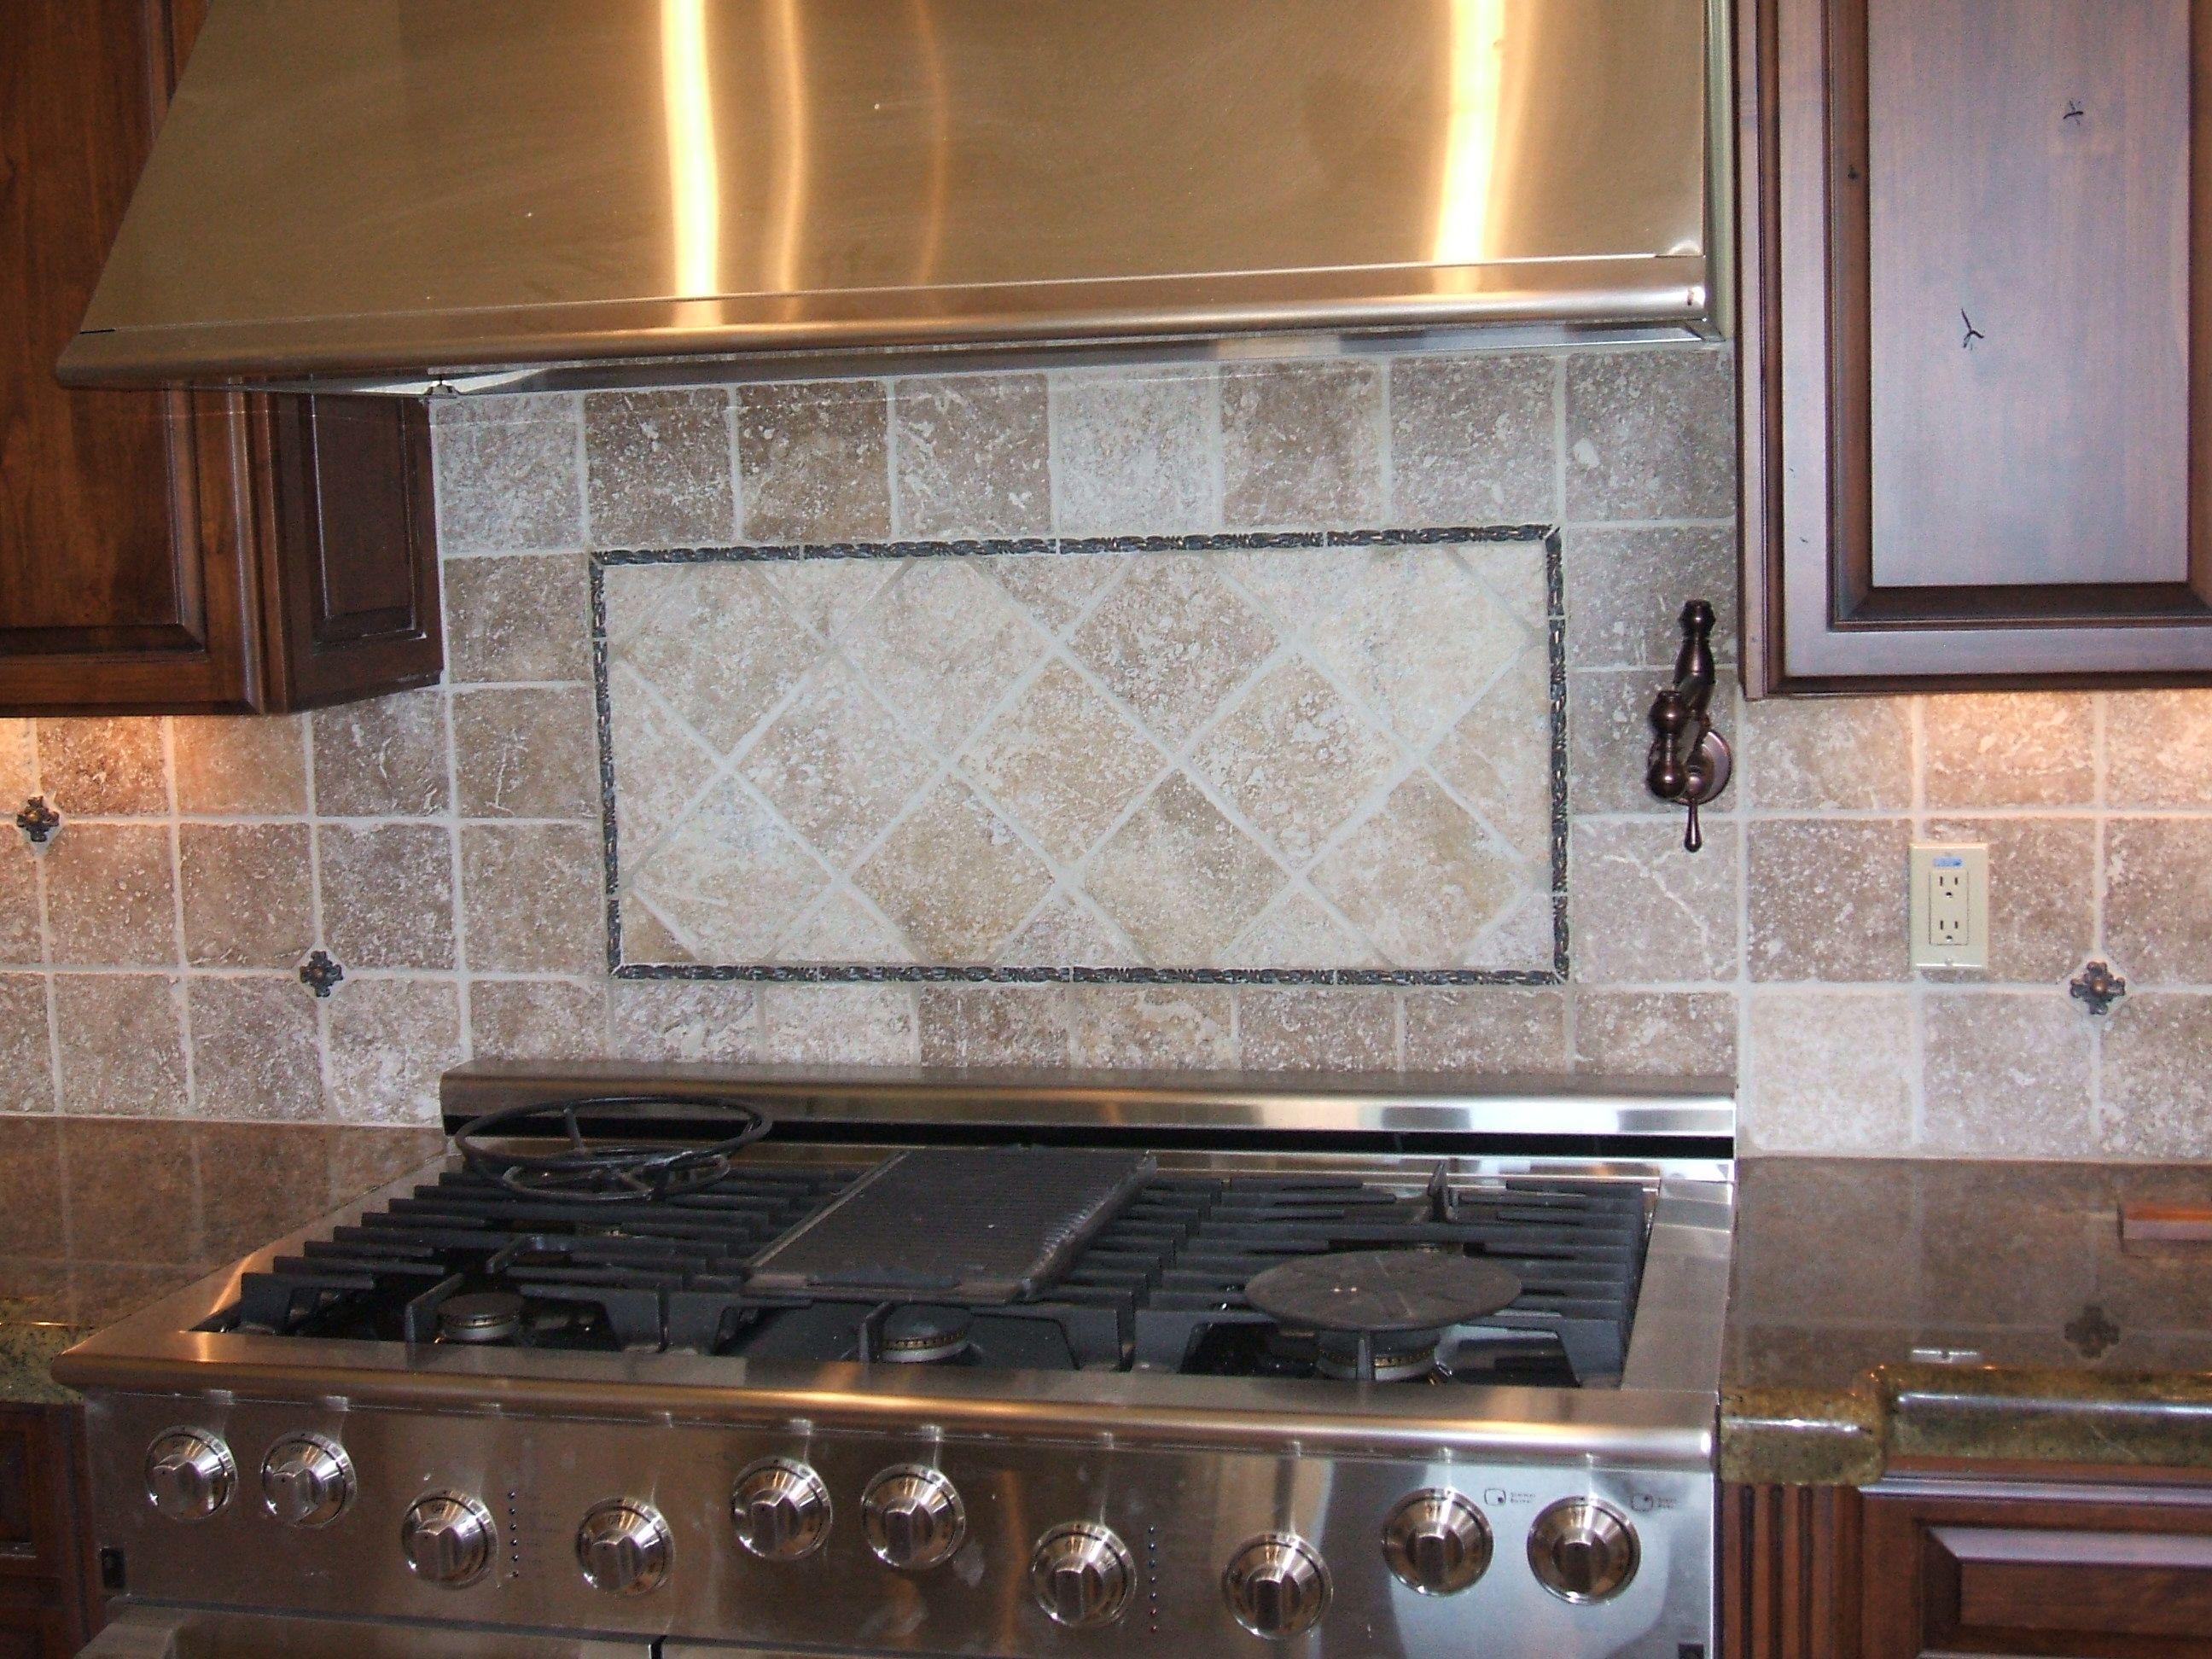 Small Kitchen Tile Backsplash Ideas In 2020